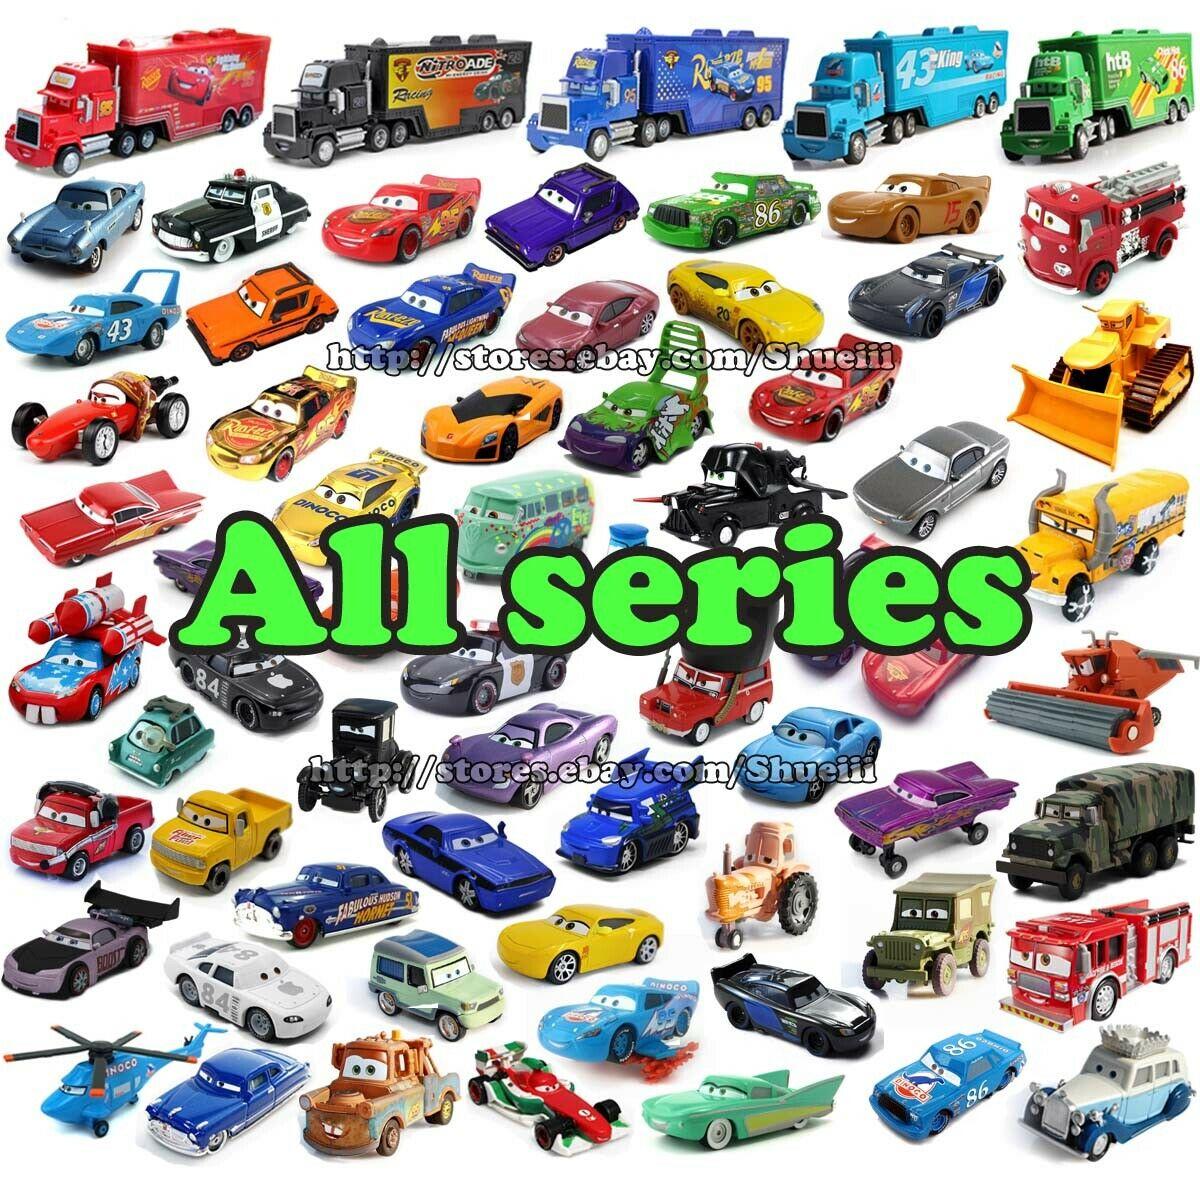 Mattel Disney Pixar Cars Lot Lightning McQueen 155 Diecast Model Cars Toy Gift